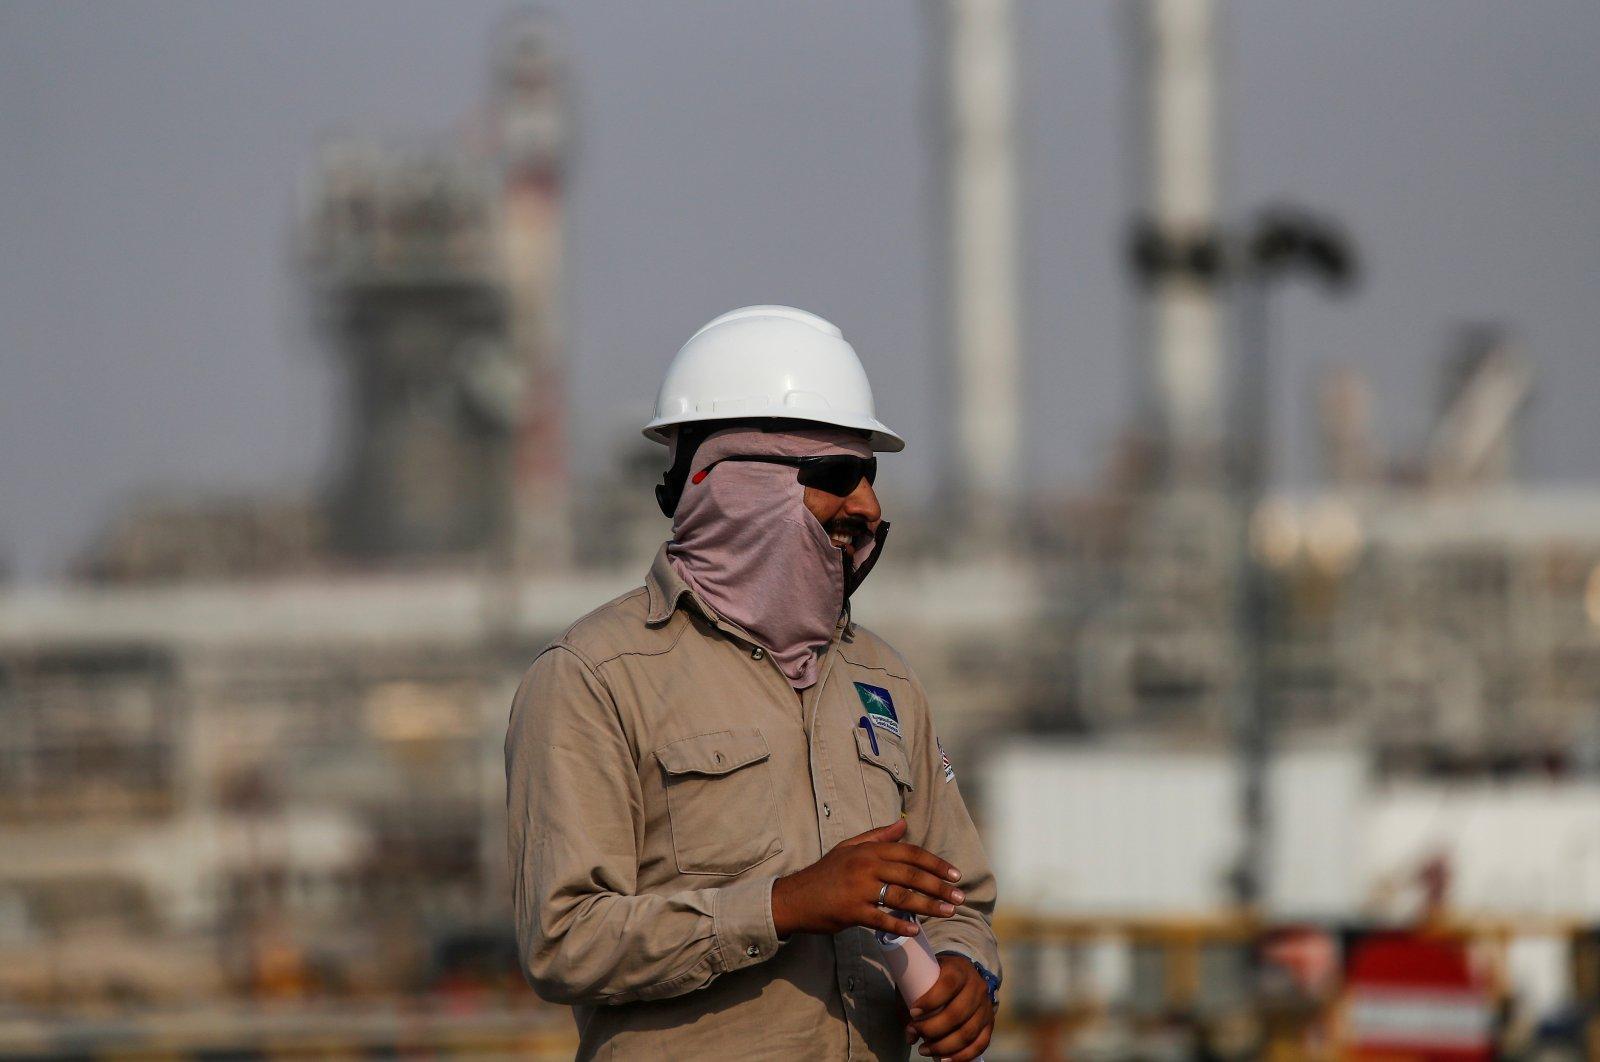 An employee looks on at the Saudi Aramco oil facility in Abqaiq, Saudi Arabia Oct. 12, 2019. (Reuters Photo)